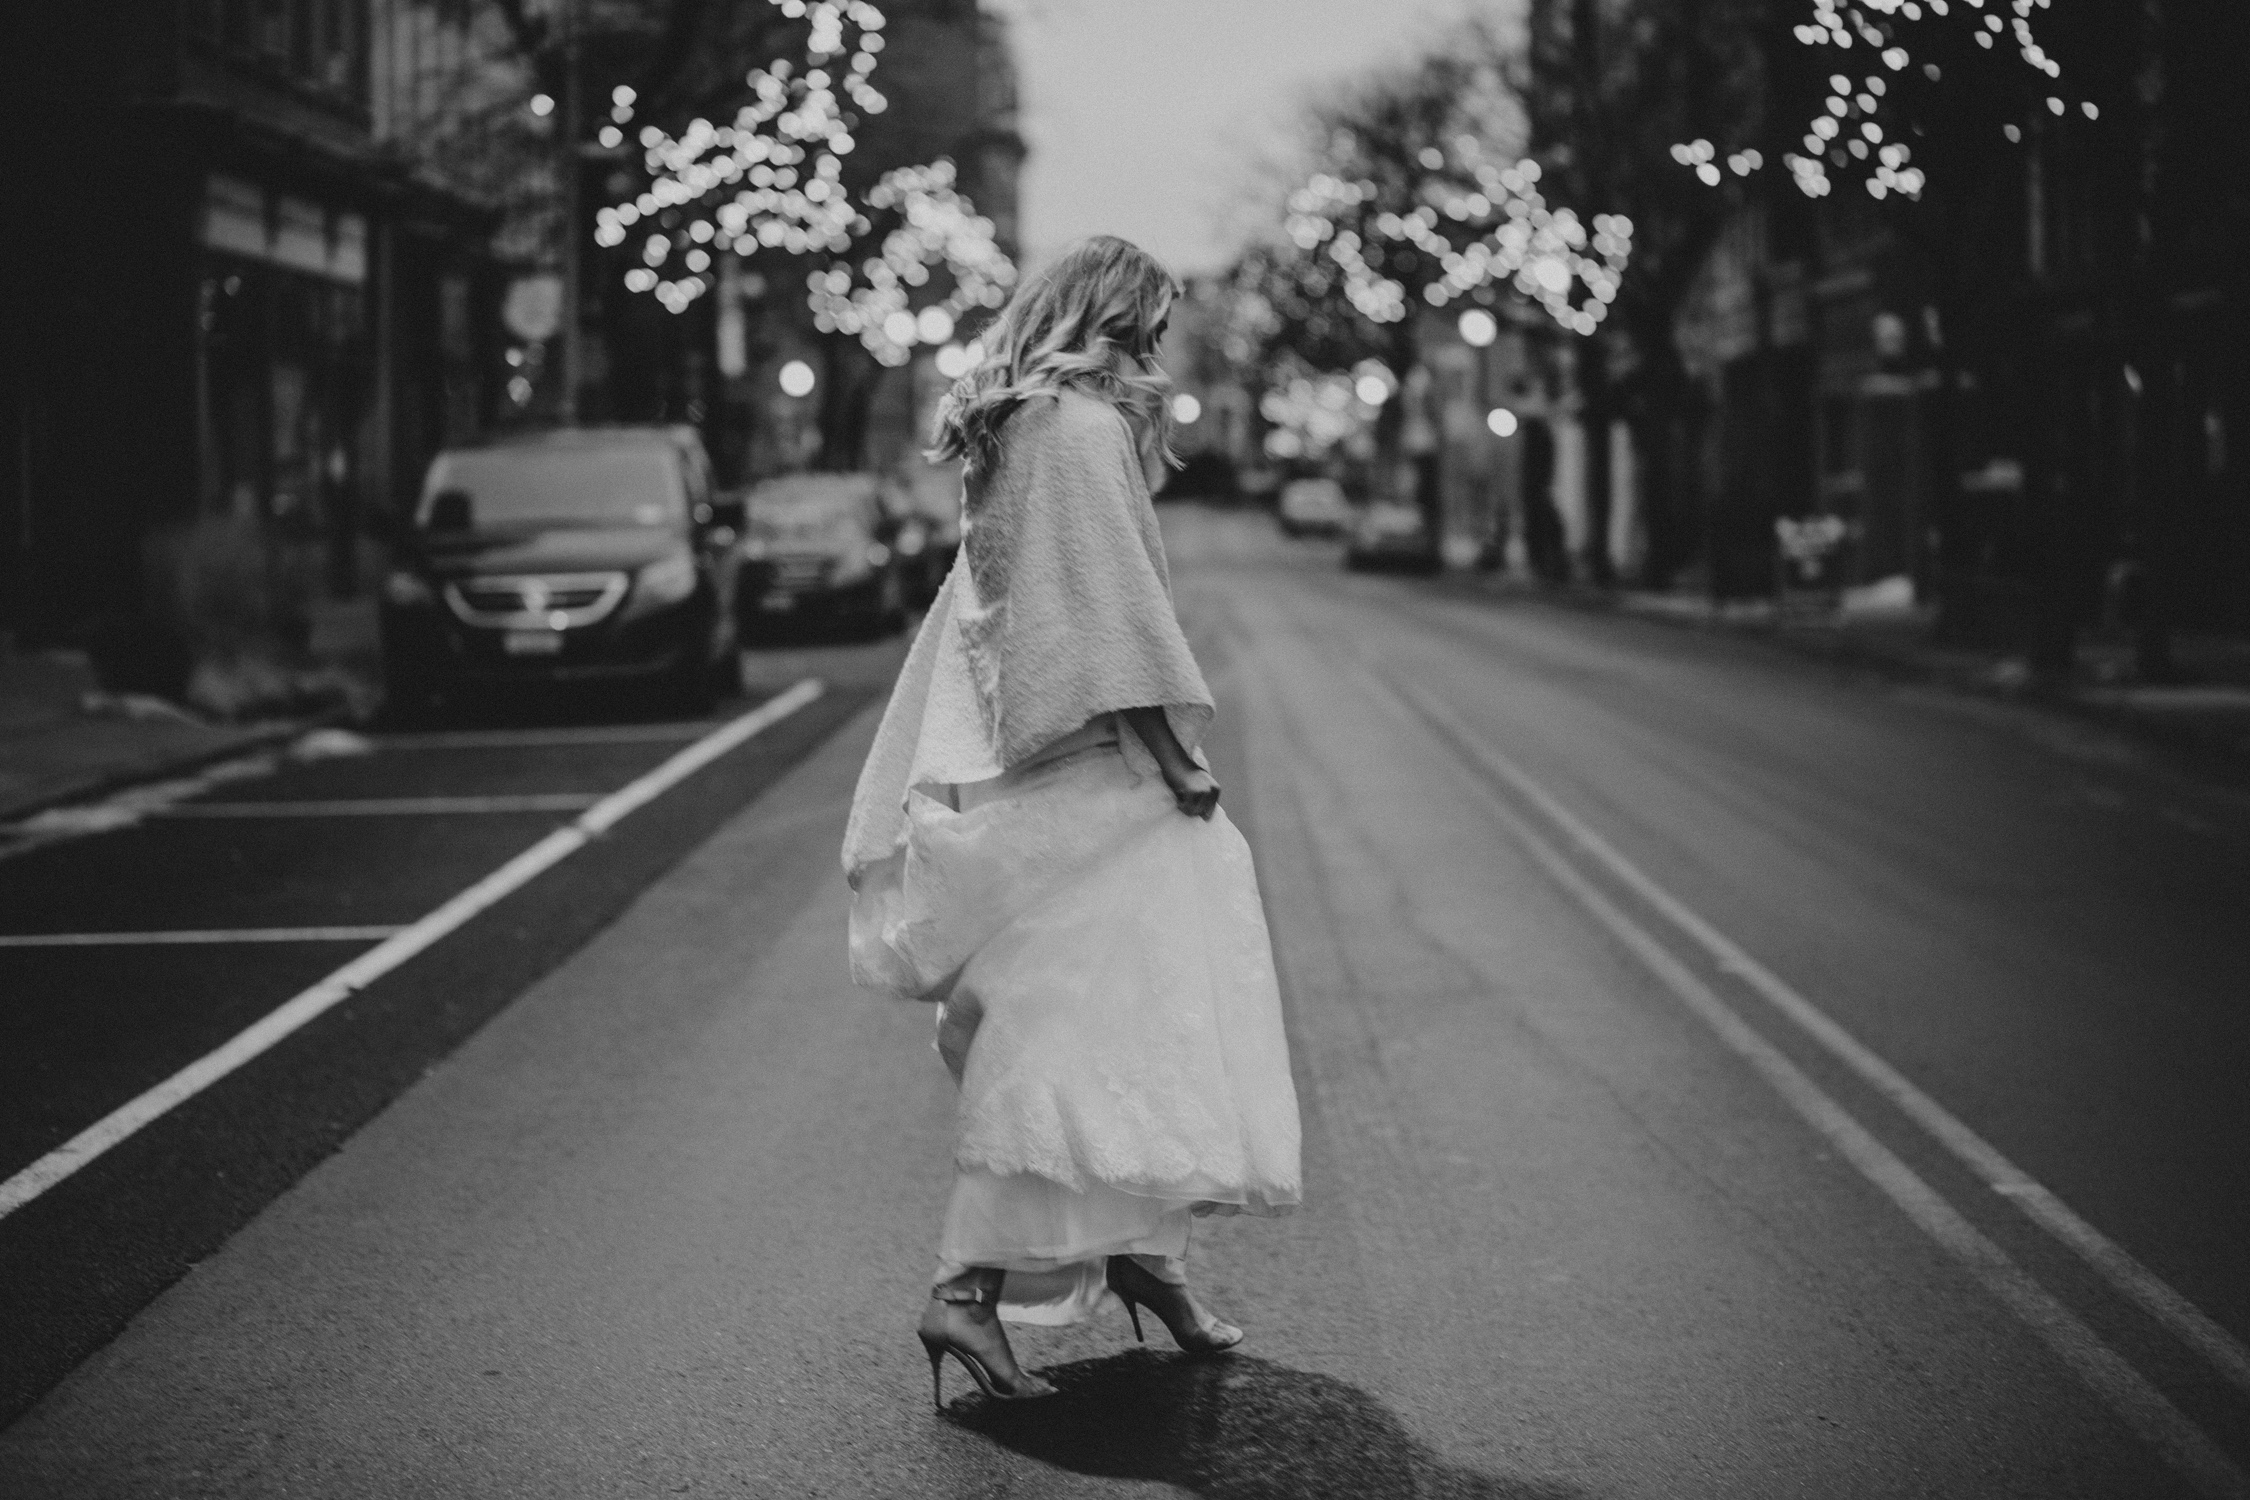 lucas_confectionery_wedding_001.jpg